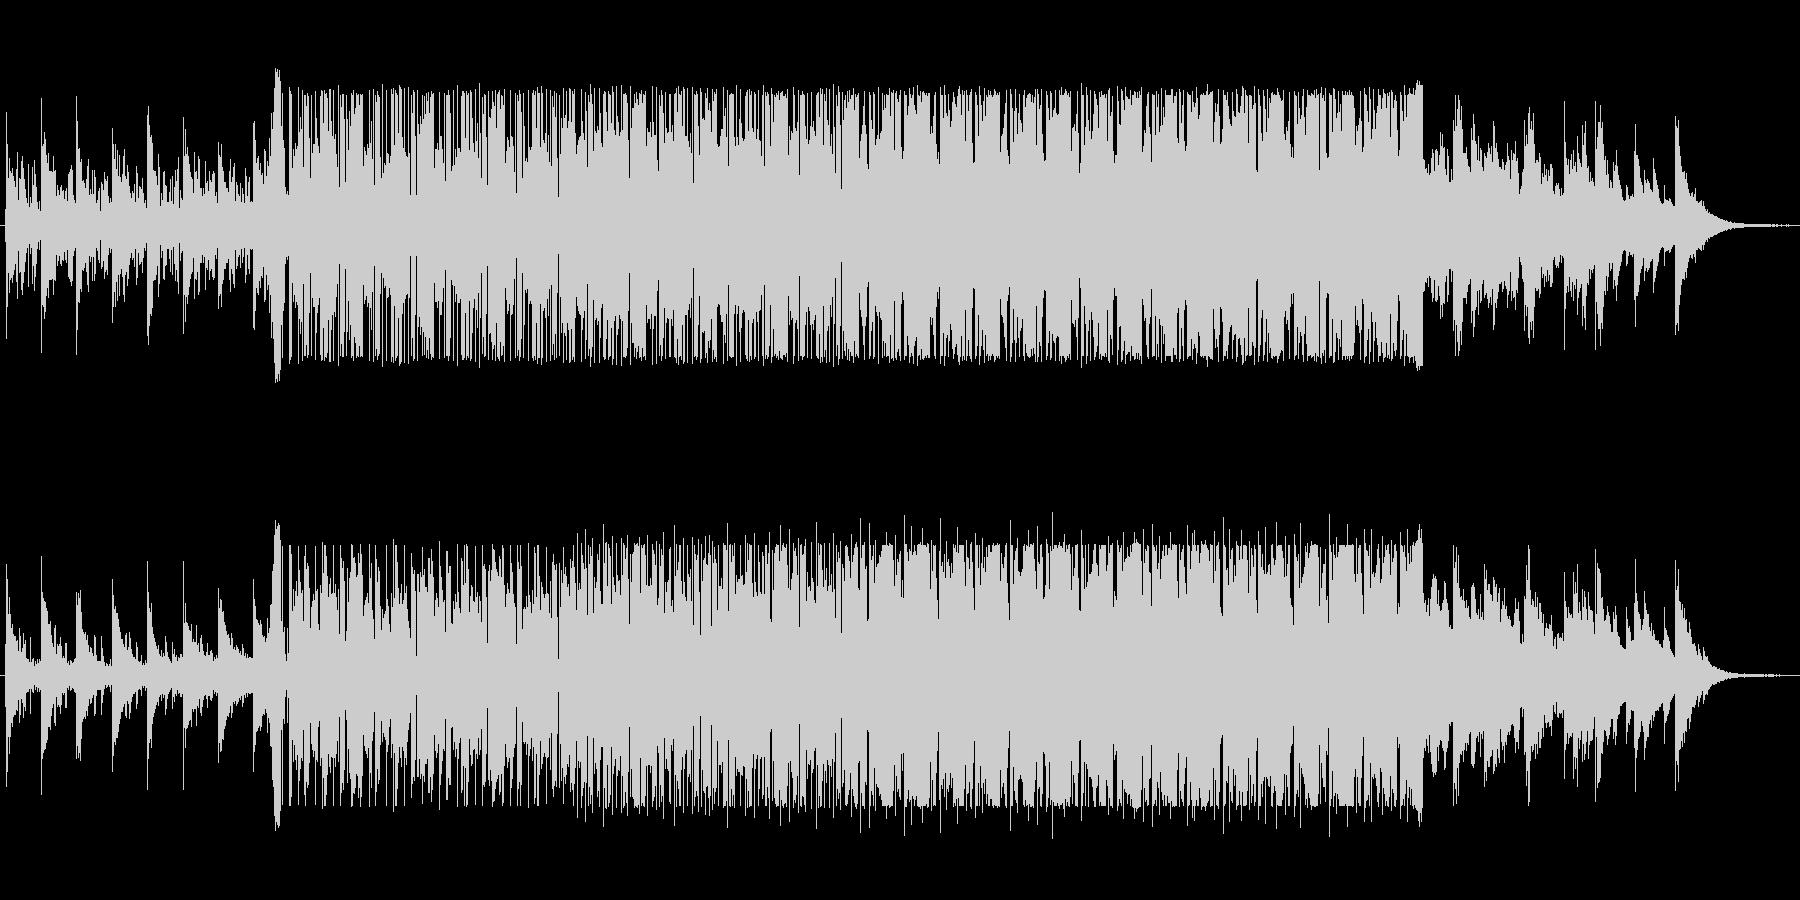 LoFiなイントロが印象的なチルアウトの未再生の波形